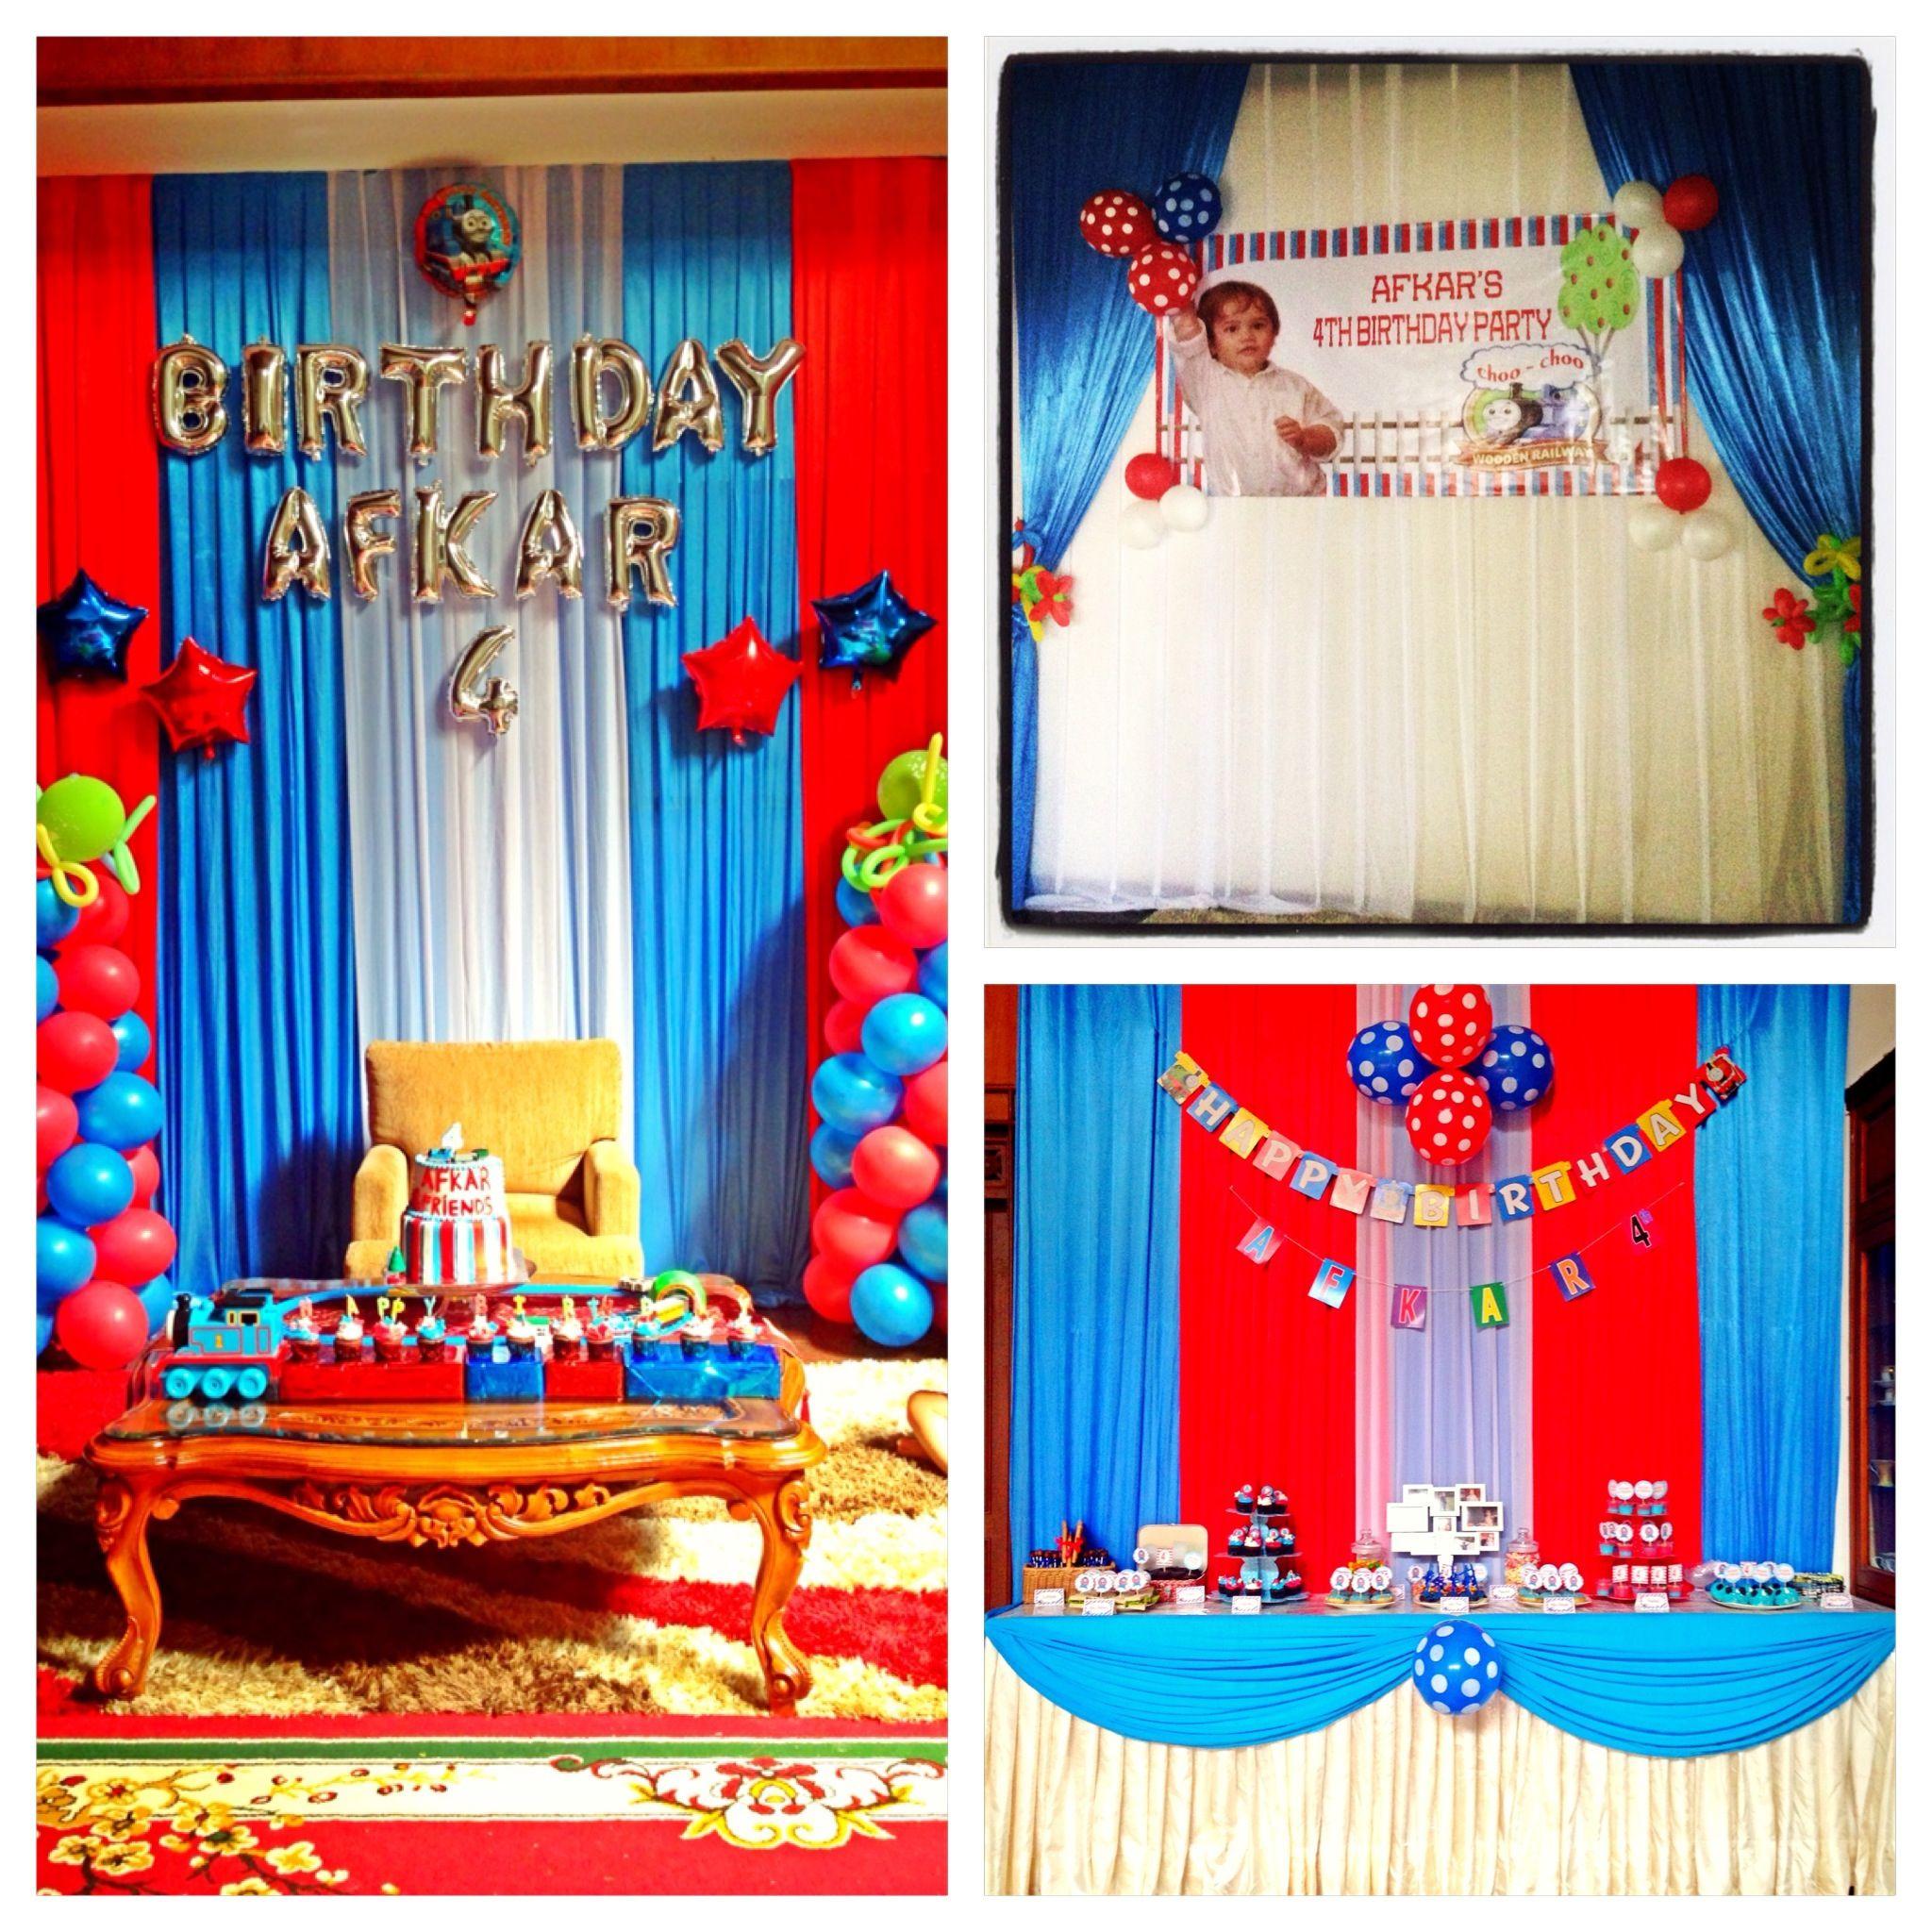 Decoration birthday party thomas and friend Birthday